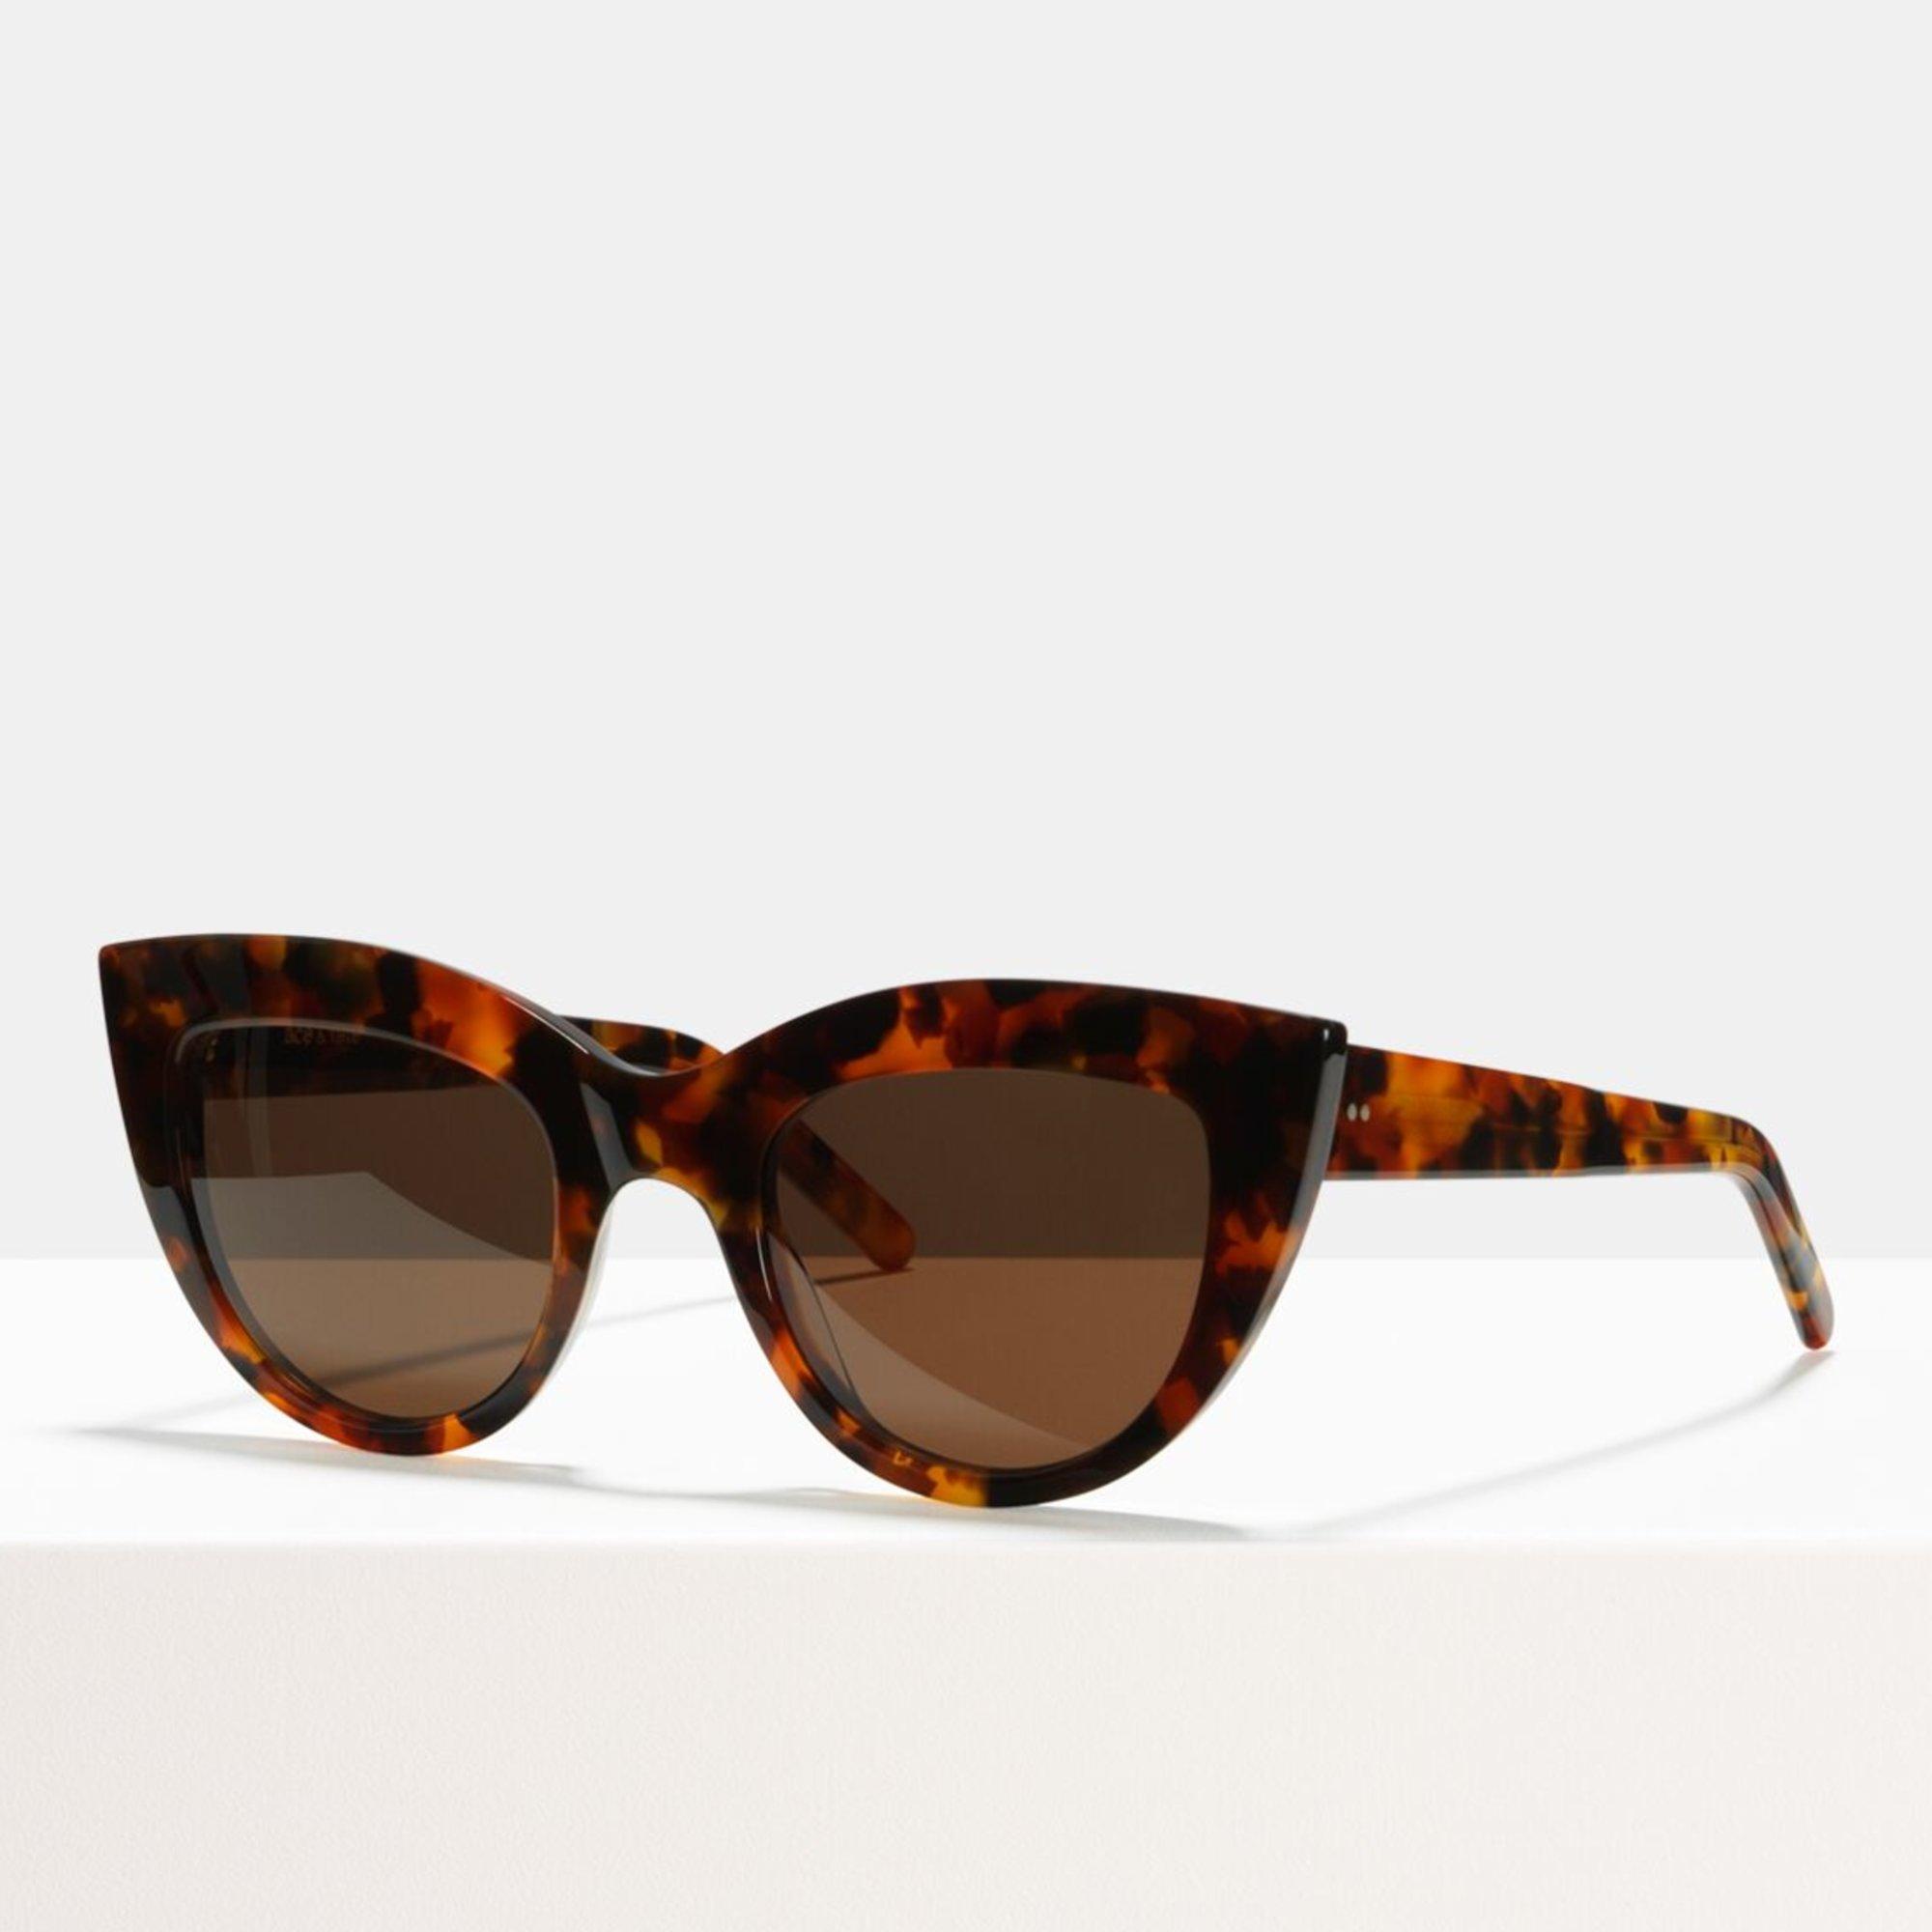 Ace & Tate Sunglasses |  acetate in Brown, Orange